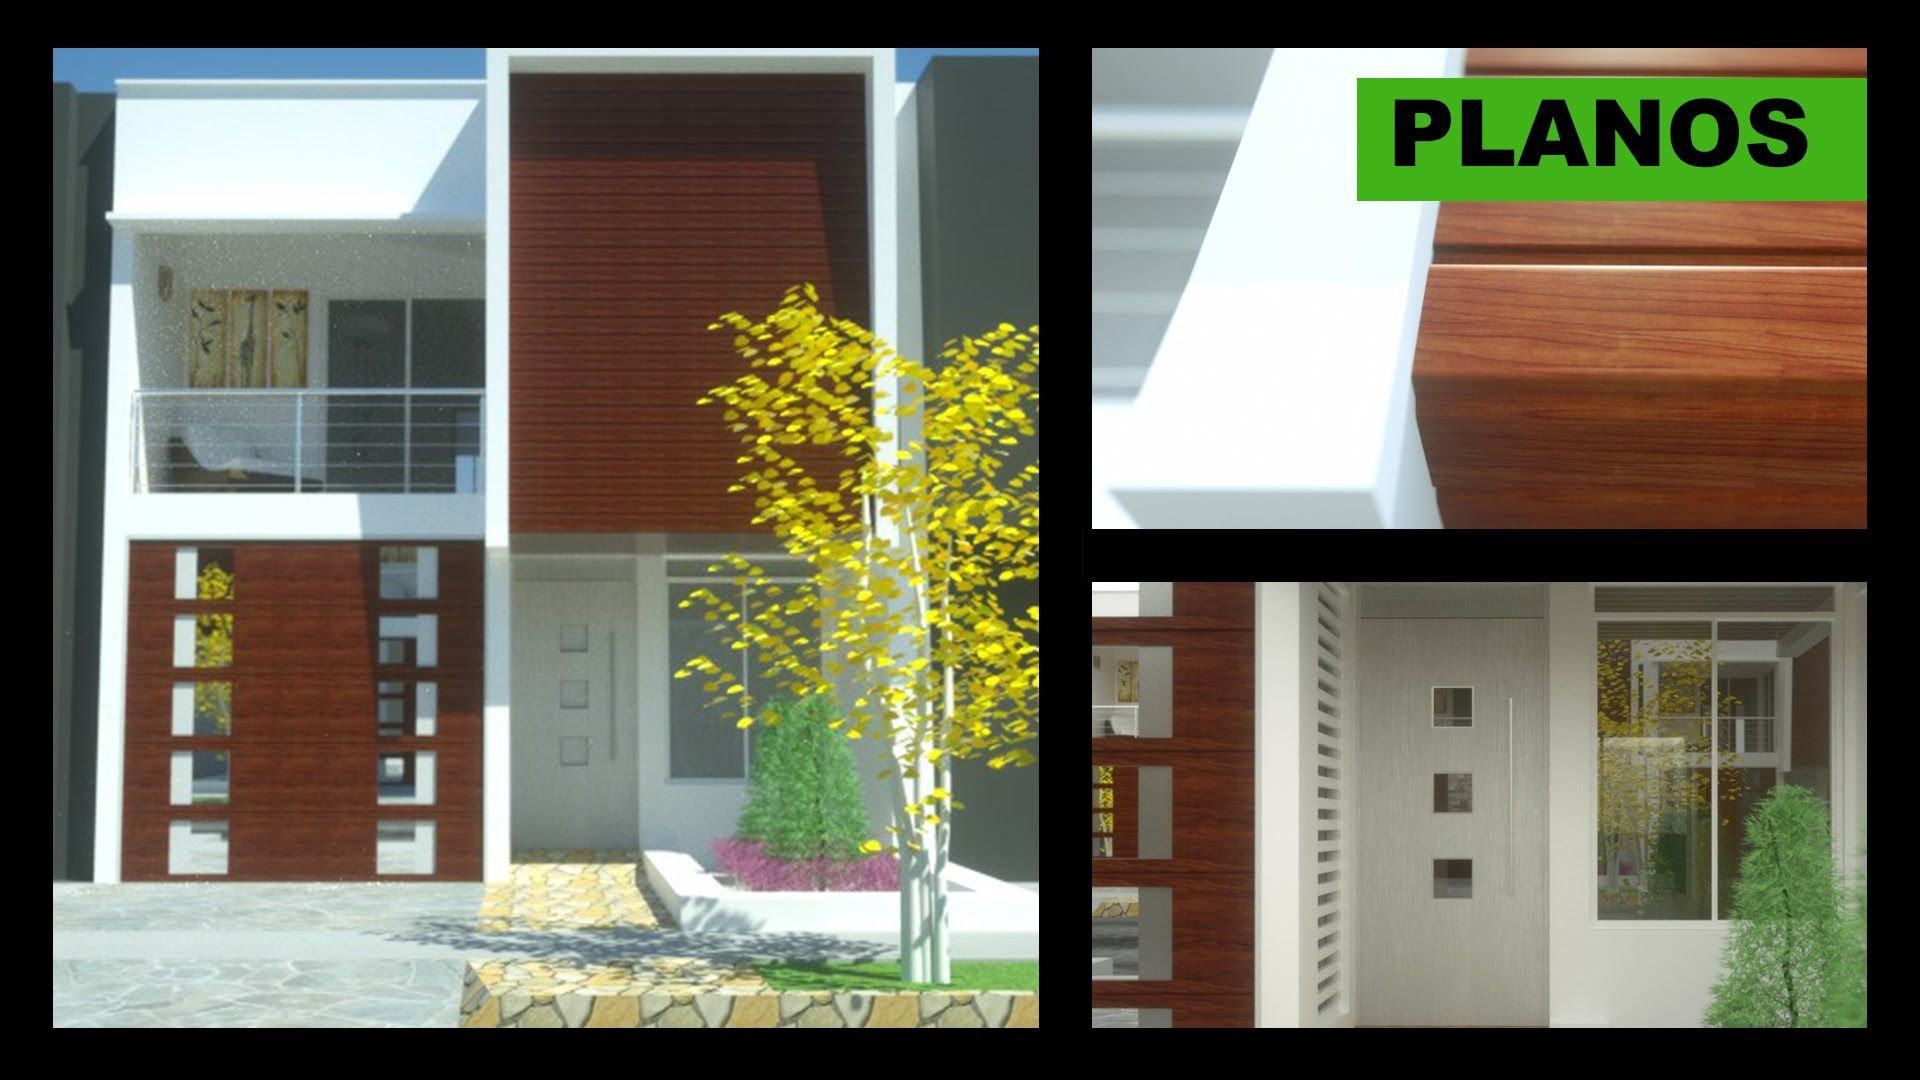 planos de casas modernas 6 x 12